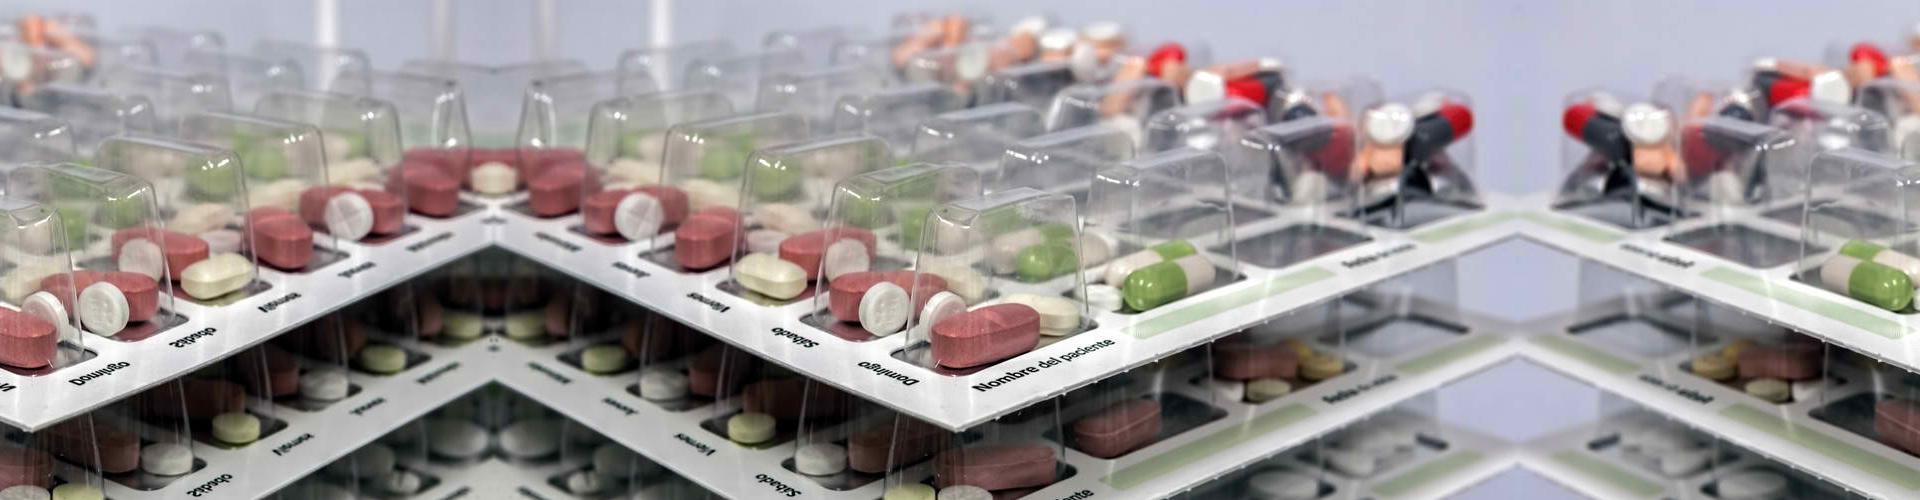 a multi-dose packaging for dispensing medications easier